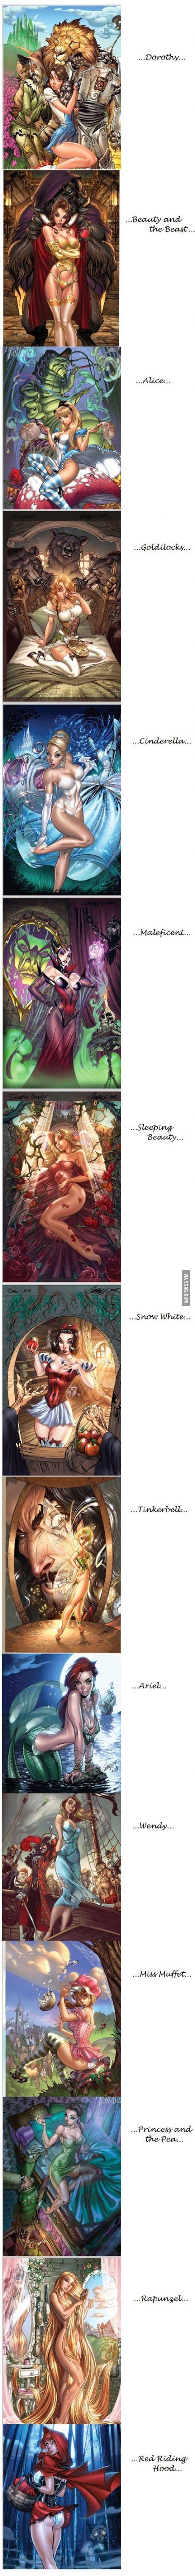 Just Disney Princesses